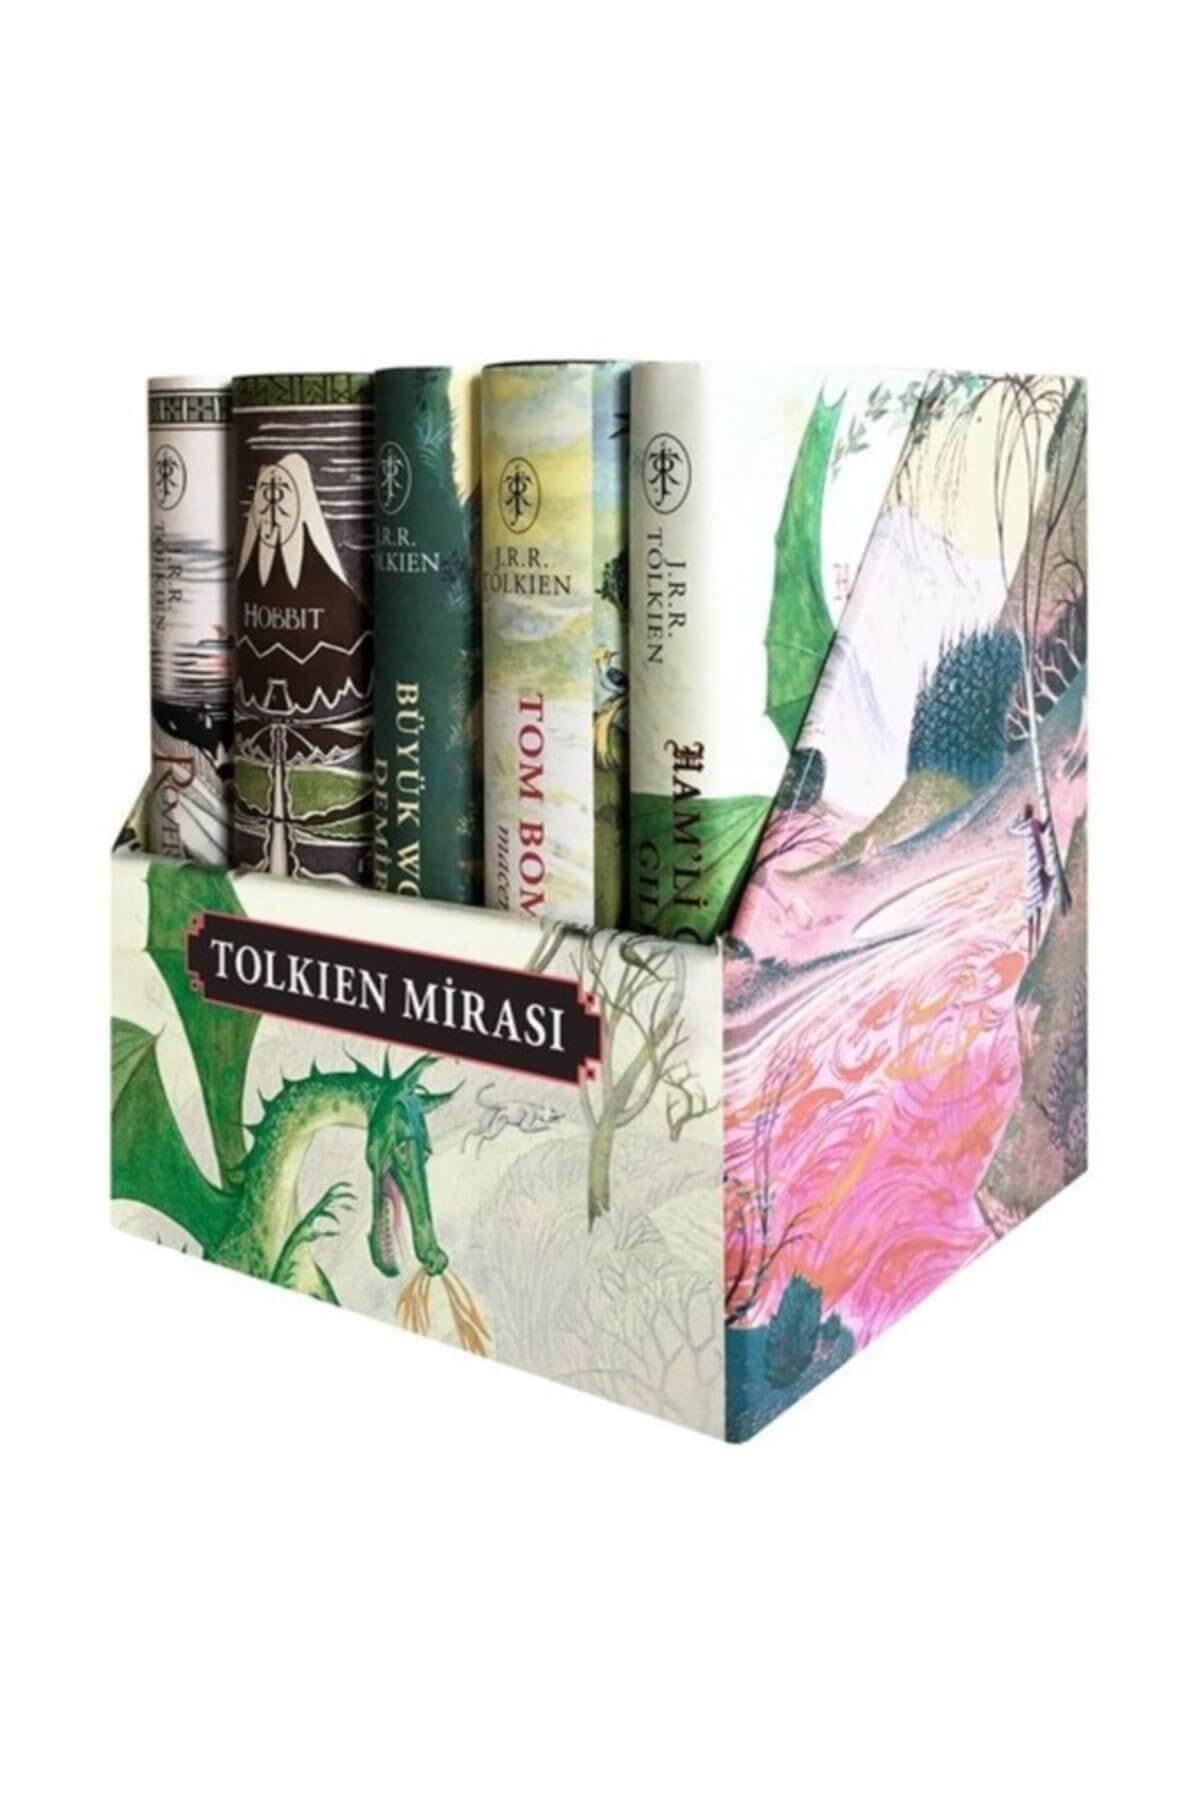 İthaki Yayınları Tolkien Mirası (Kutulu 5 Kitap) - J.R.R. Tolkien 1